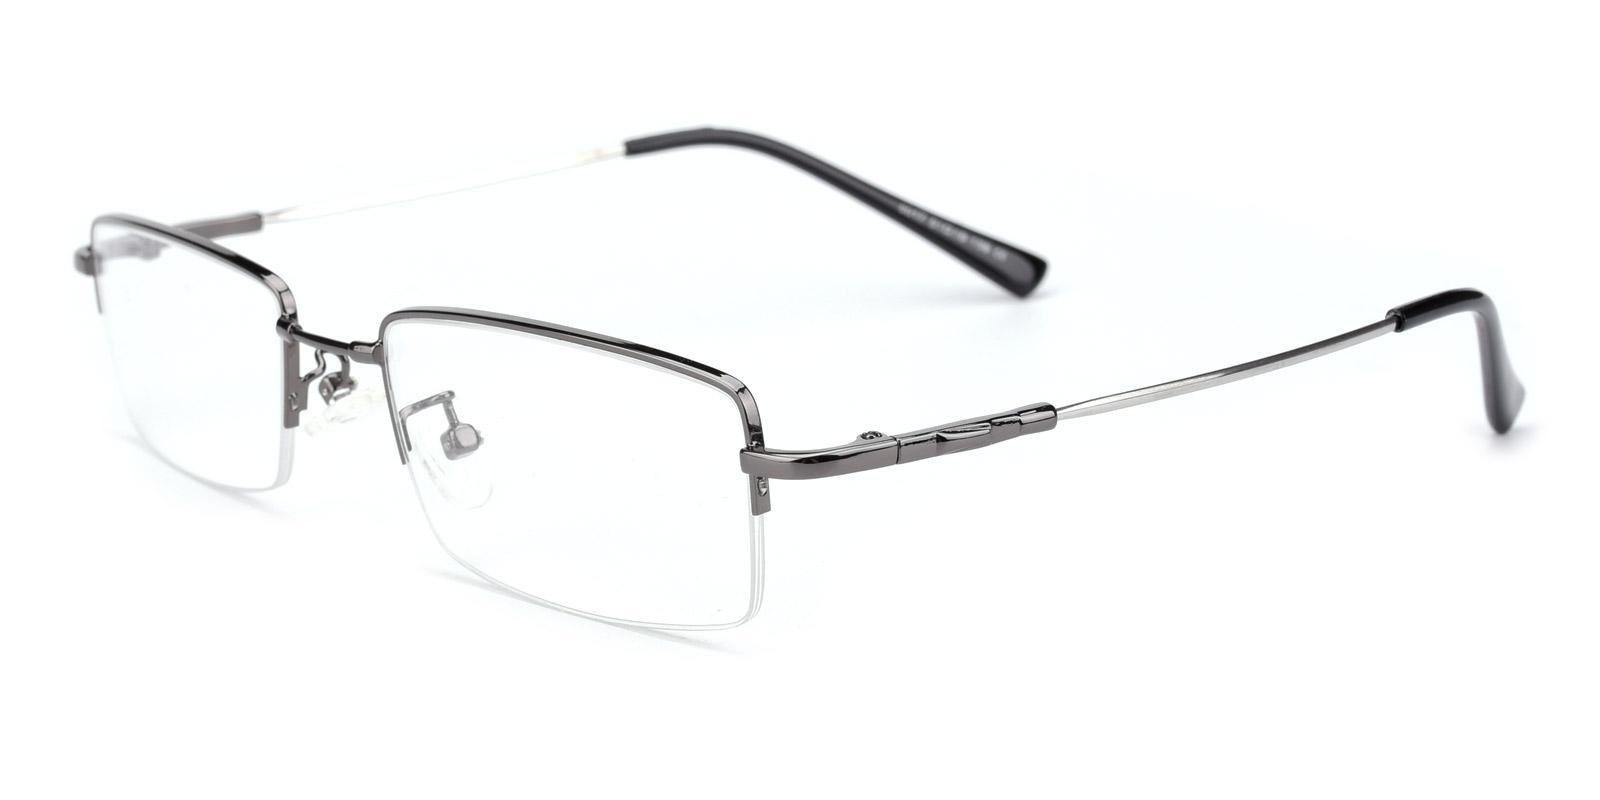 Pluto-Gun-Rectangle-Metal-Eyeglasses-additional1